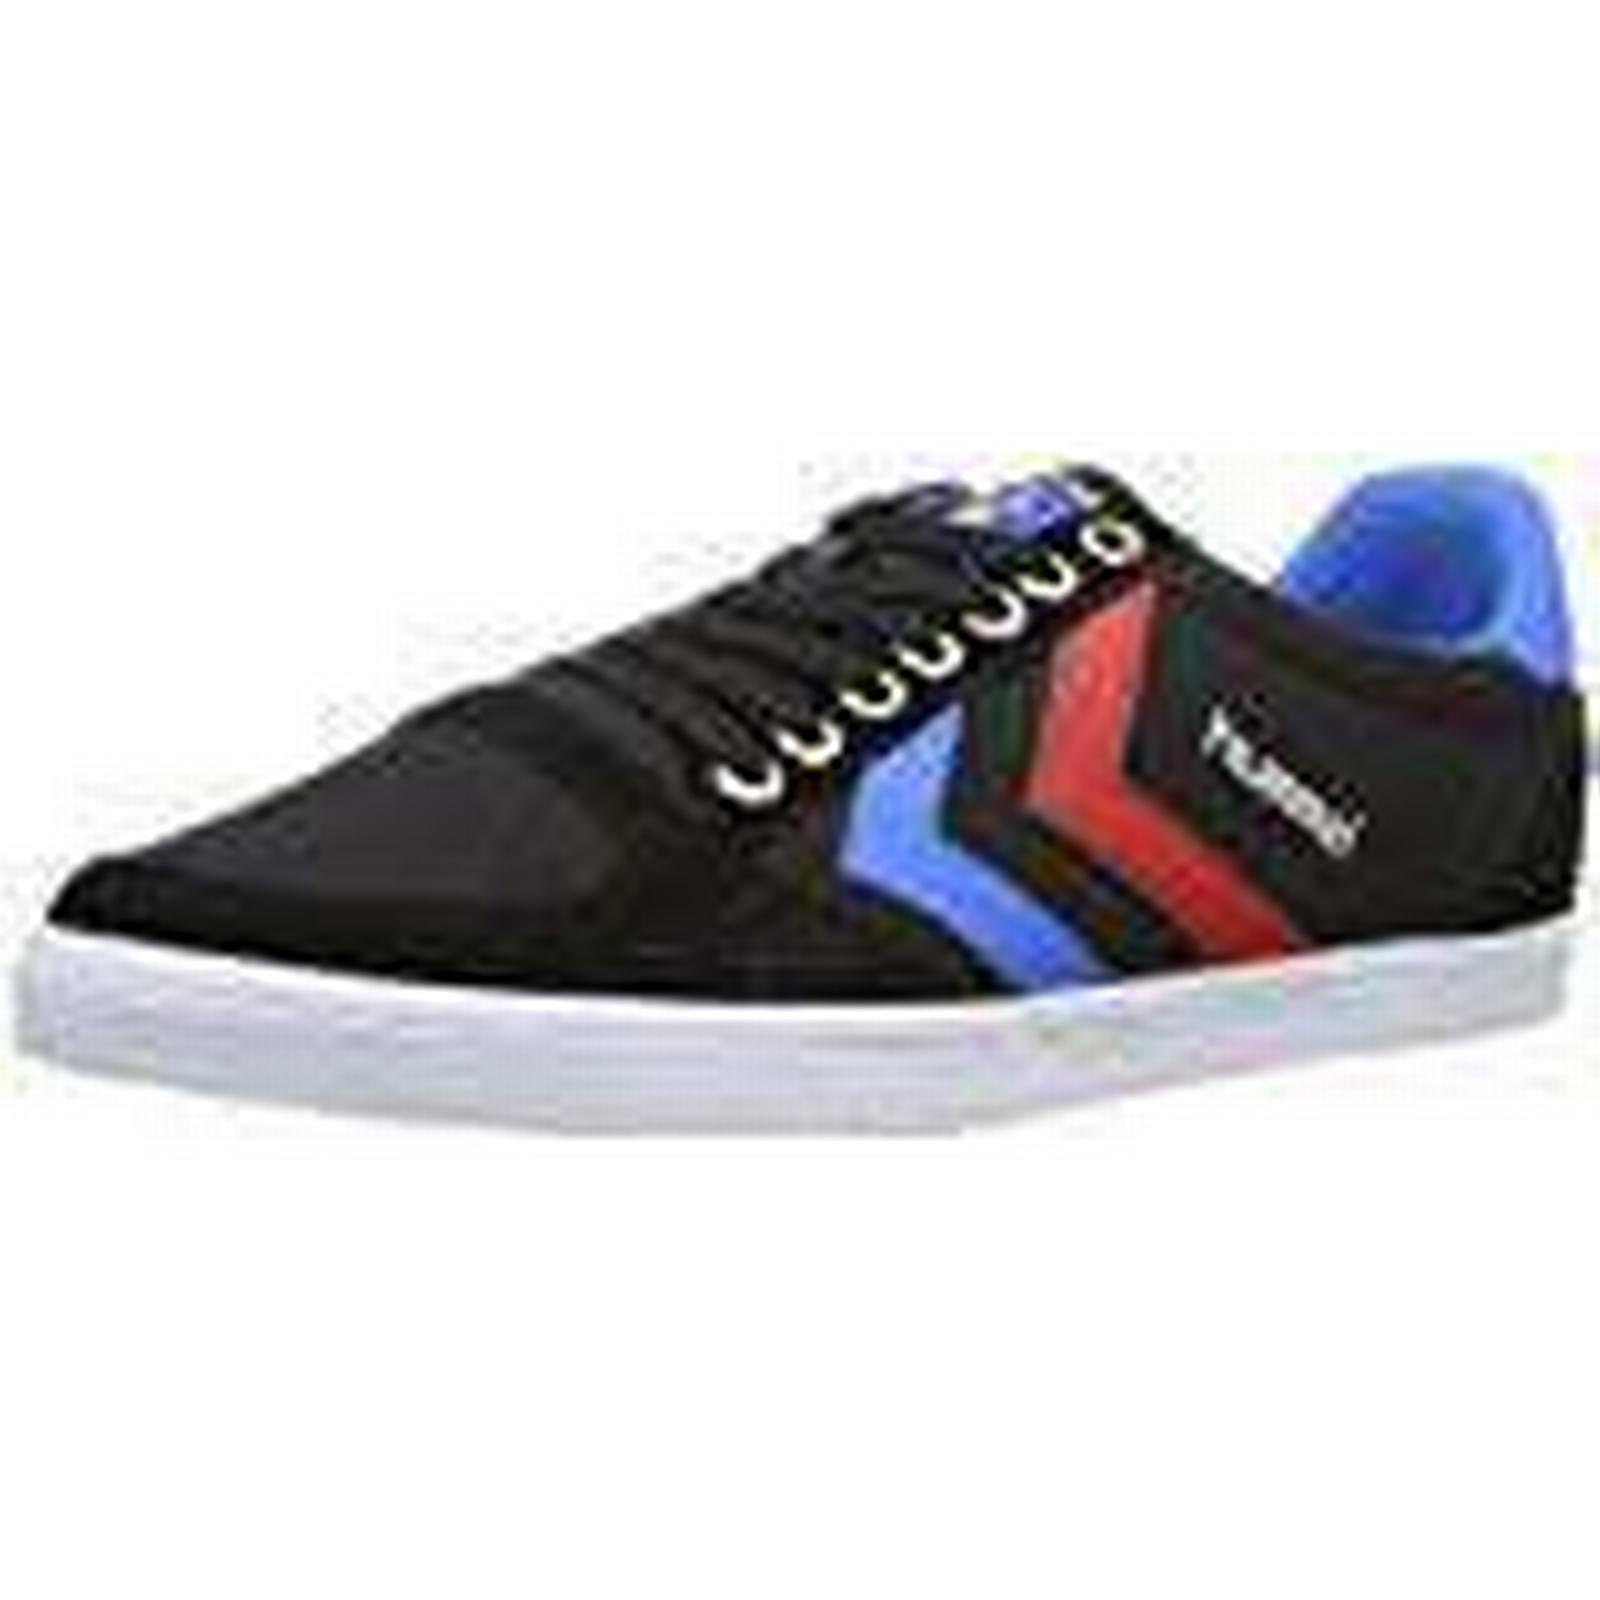 Hummel Unisex Adults Slimmer Stadil (Black/Blue/Red Canvas, Low-Top Sneakers, Black (Black/Blue/Red Stadil 2640), 13 UK (48 EU UK) a3c32e